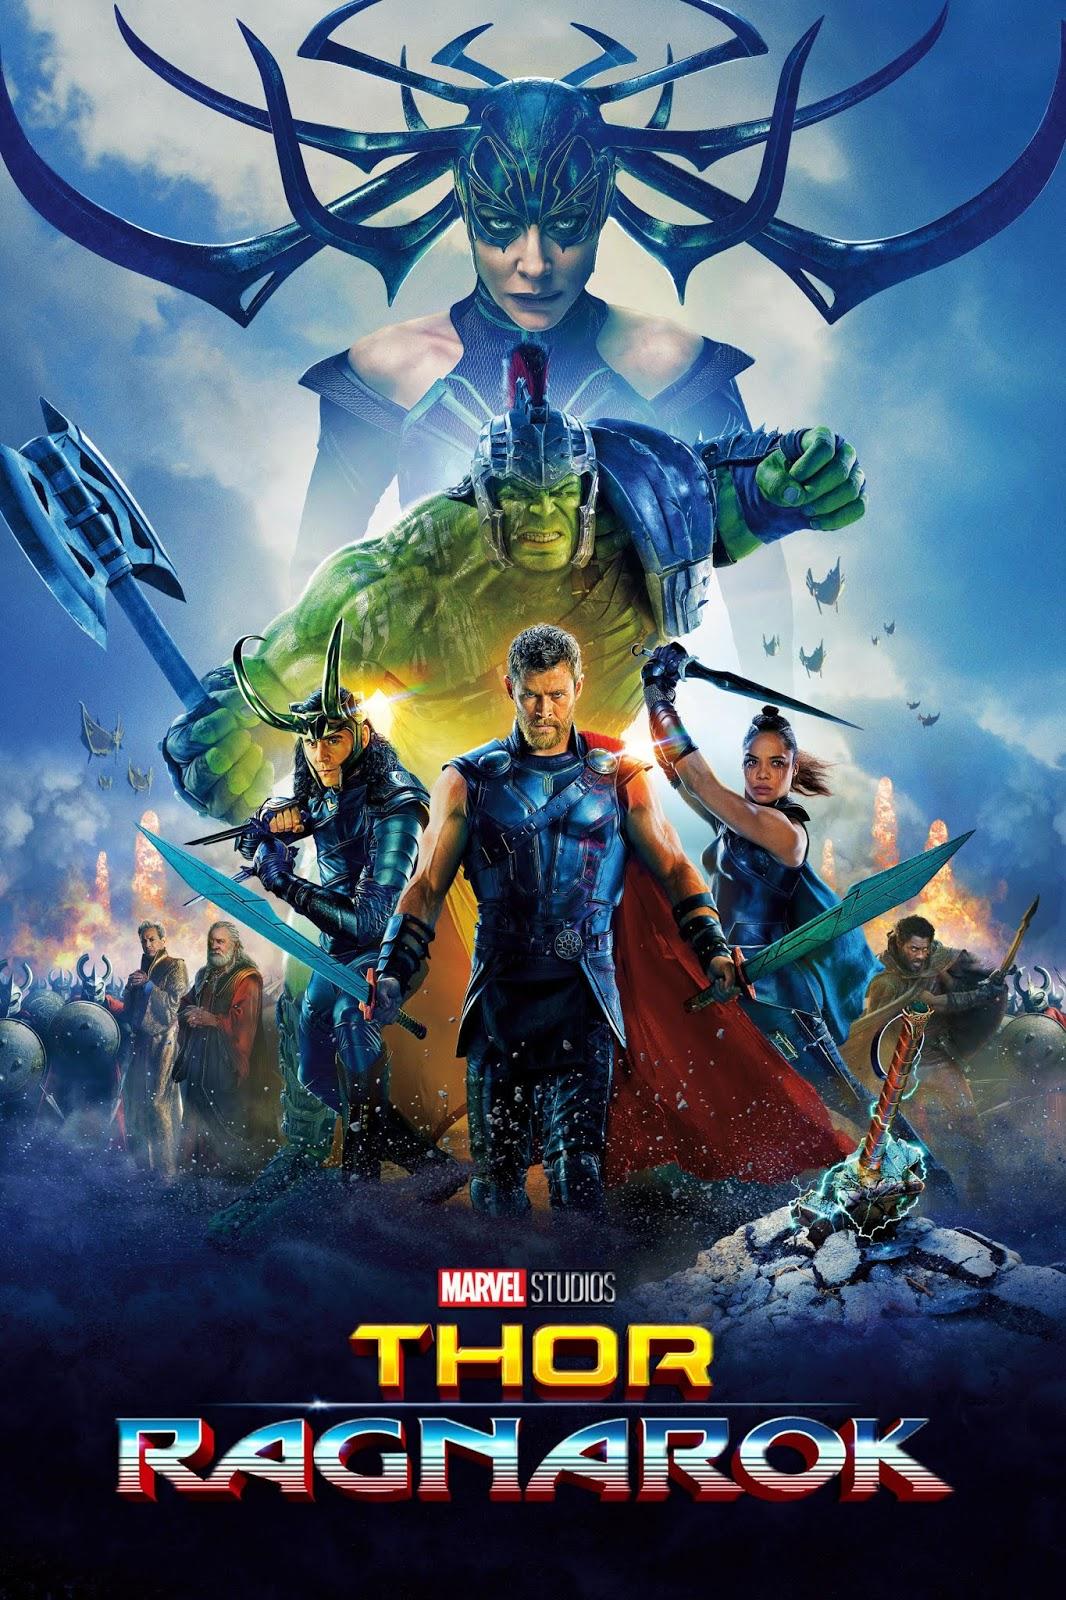 foto de Thor : Ragnarok (2017) [English+Hindi] BluRay 1080p, 720p, 480p ...